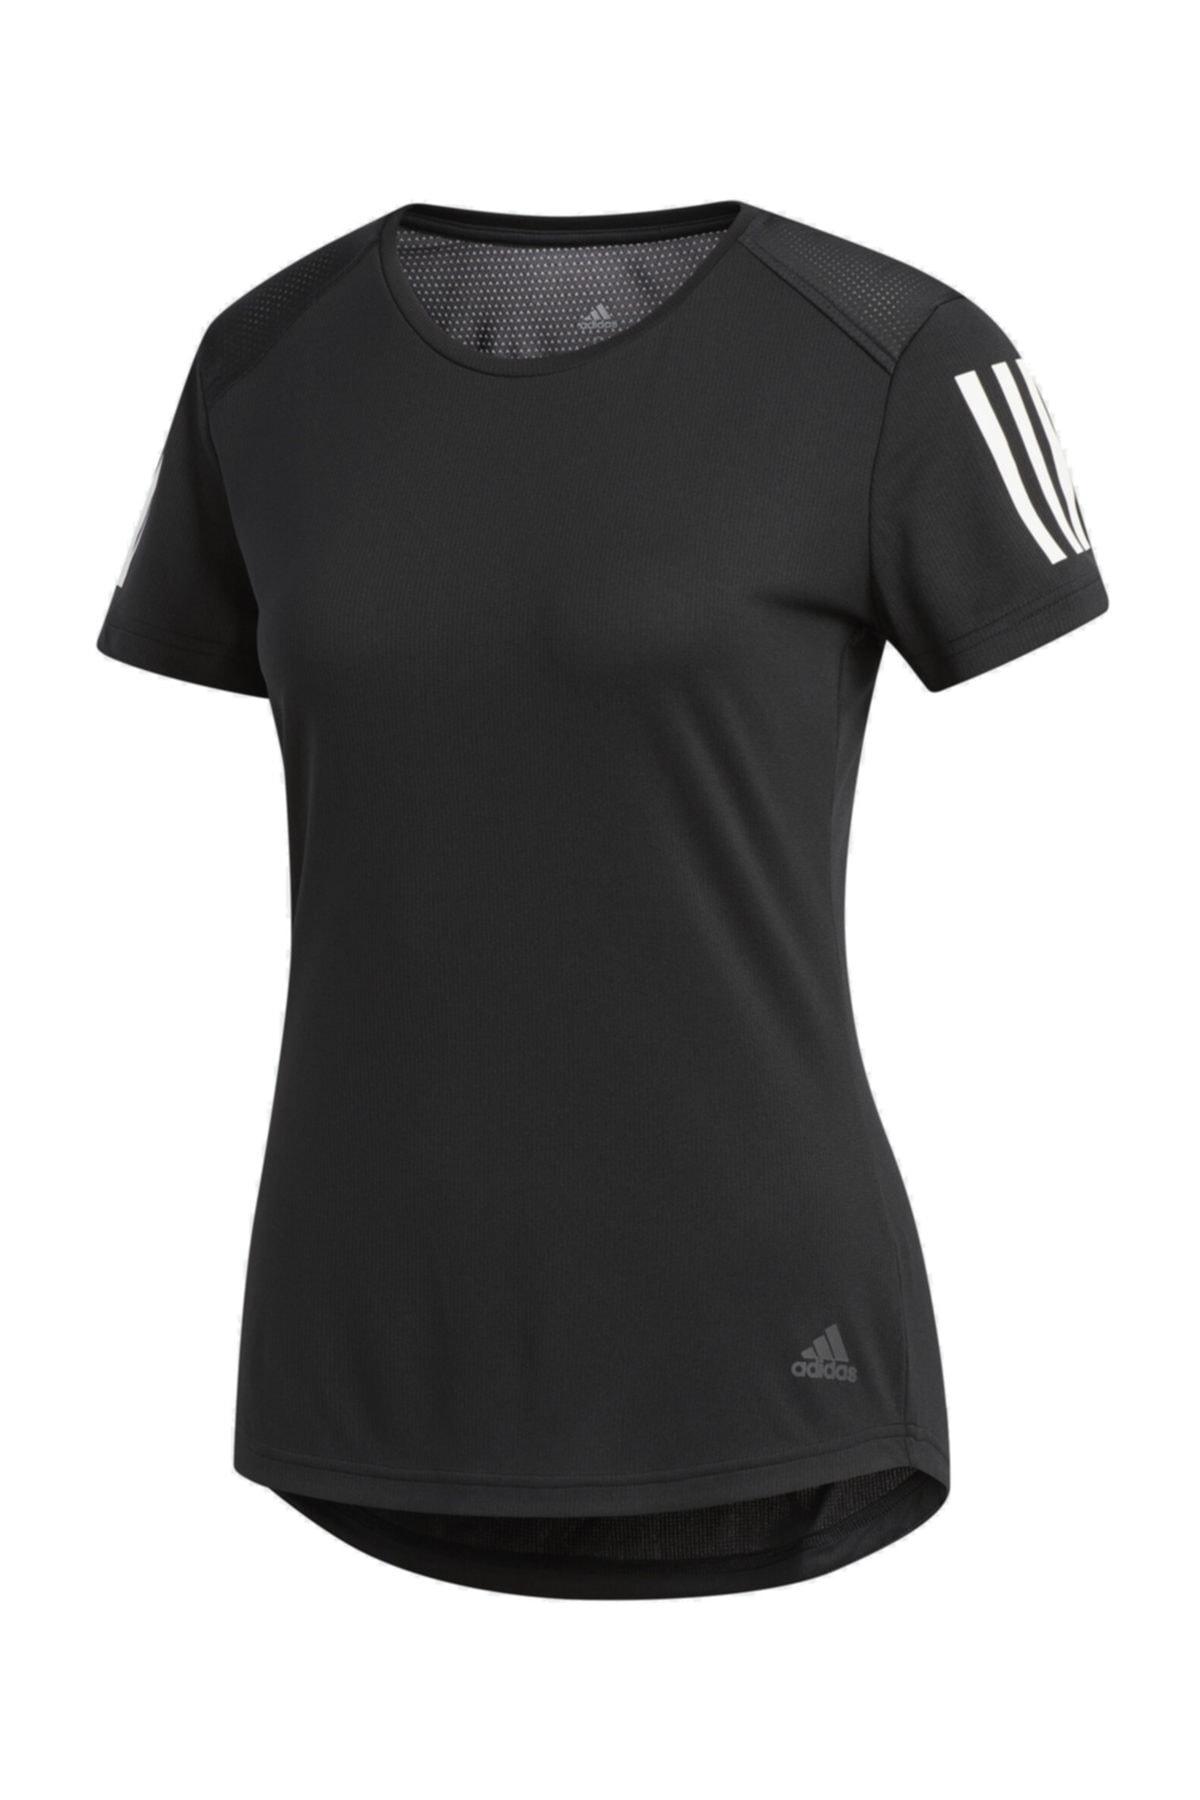 adidas OWN THE RUN TEE Siyah Kadın T-Shirt 101117560 2